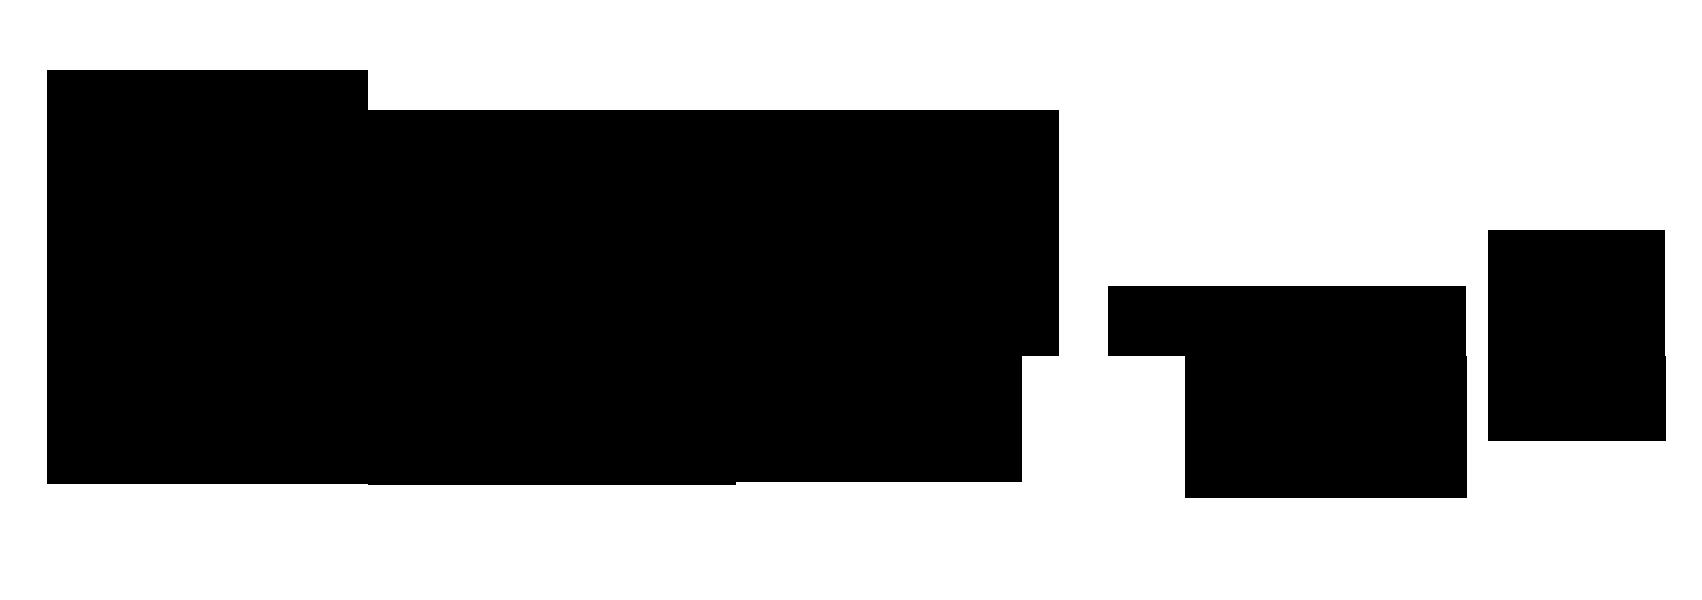 samsung galaxy tab logo